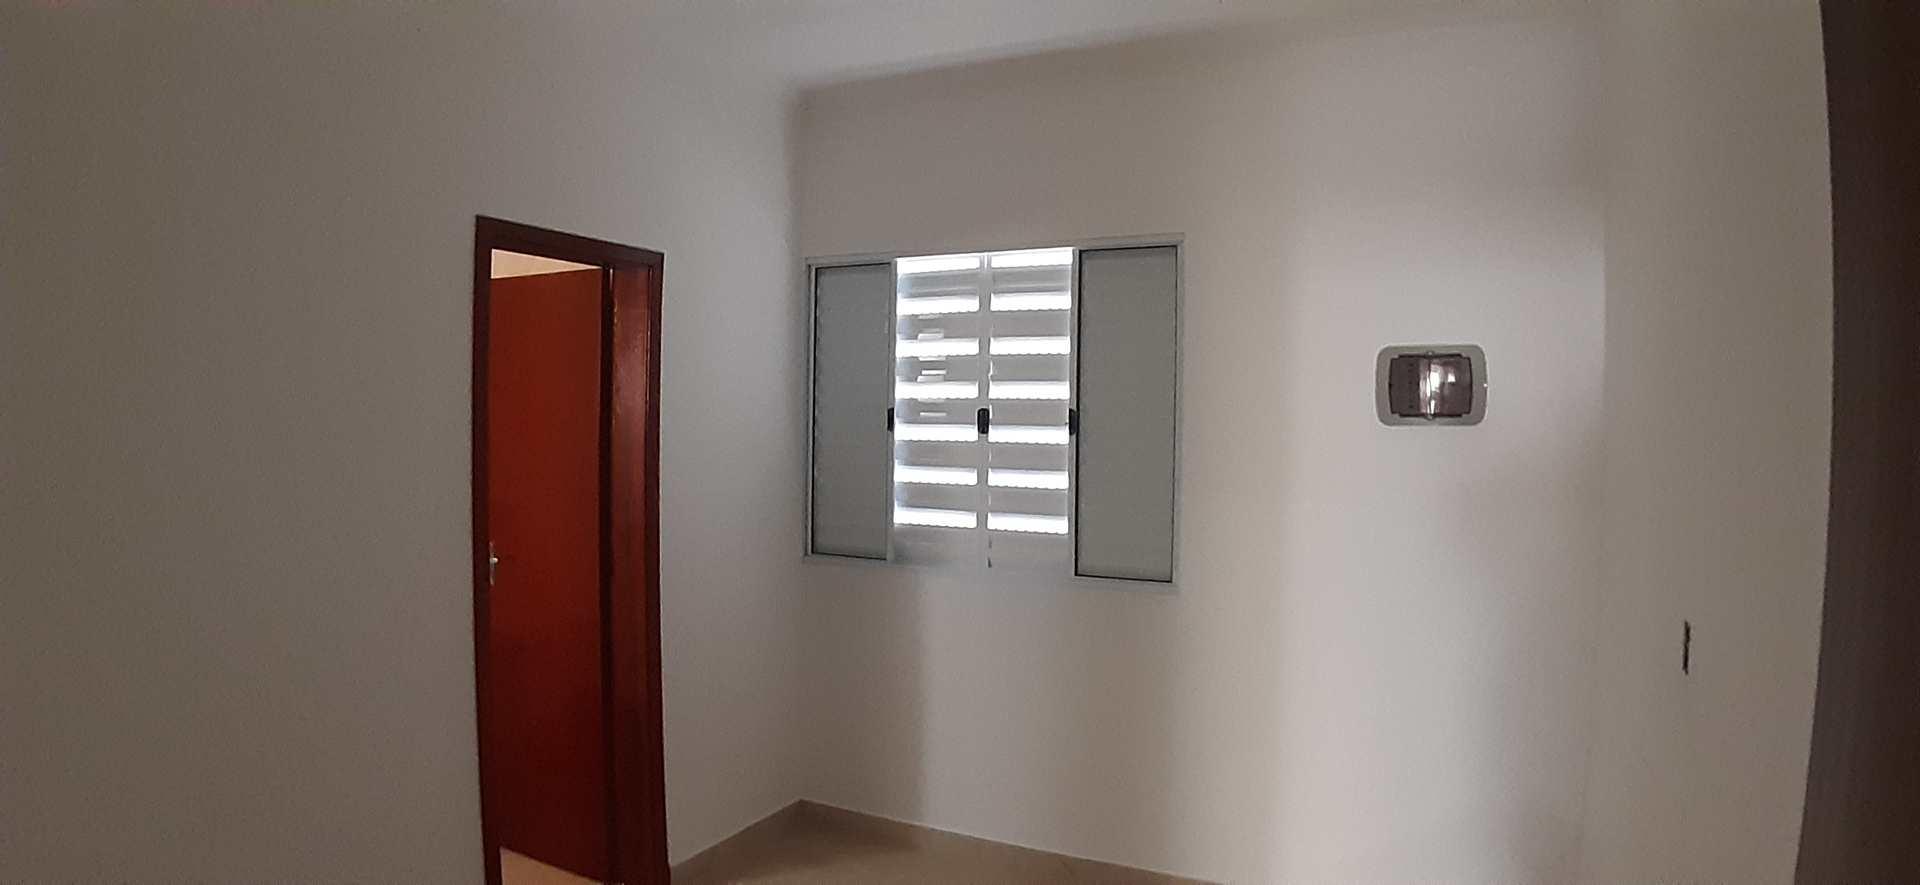 Casa com 3 dorms, Jardim Bopiranga, Itanhaém - R$ 270 mil, Cod: 5613